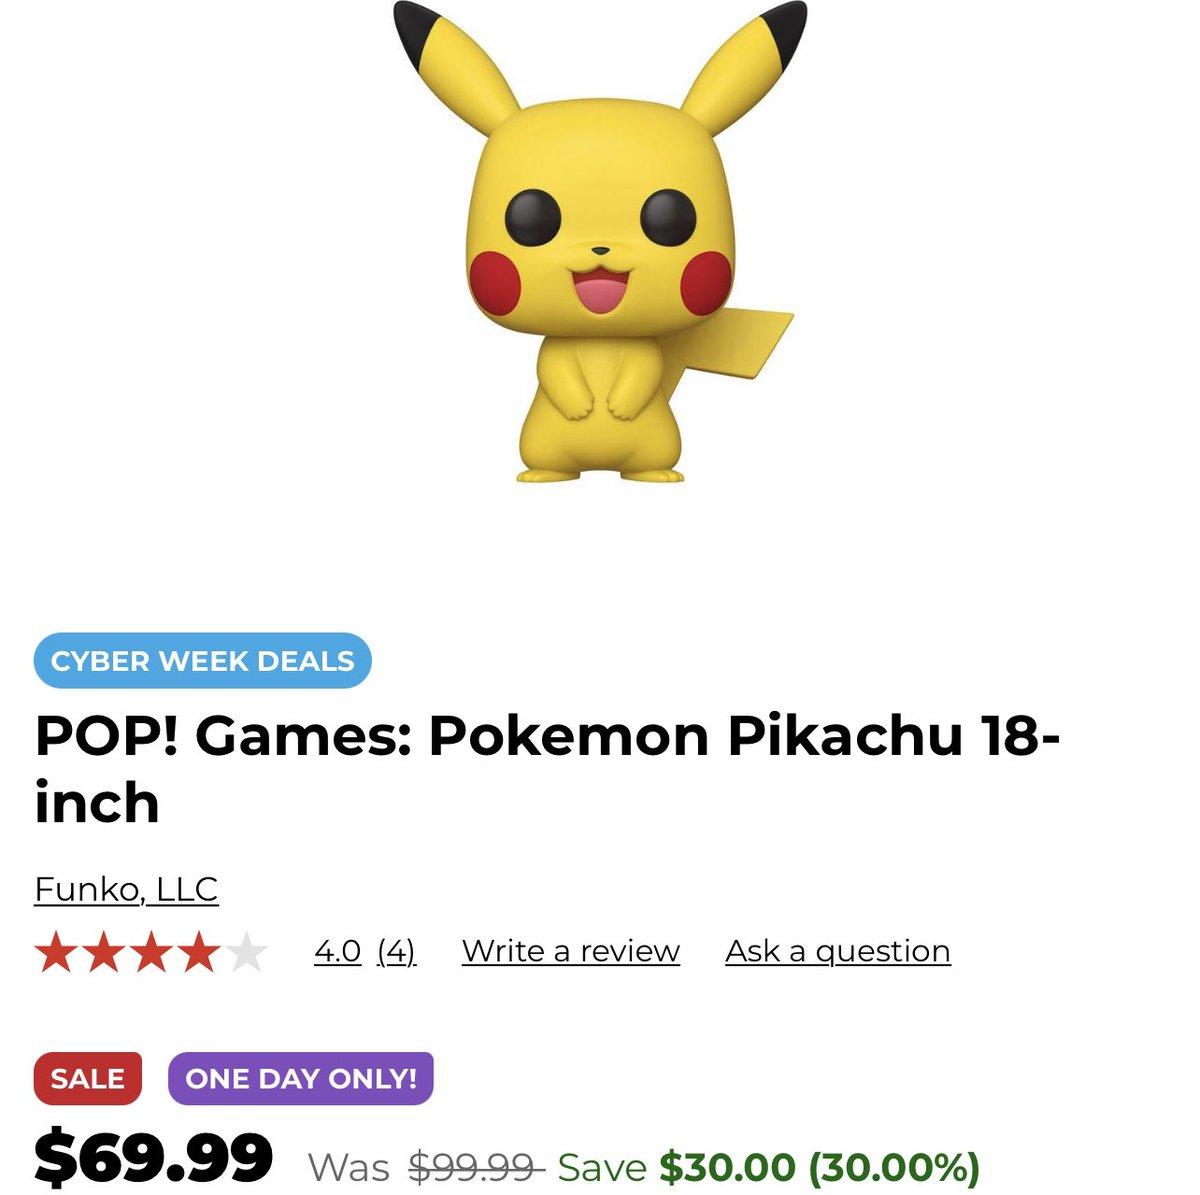 "Cyber Week Deal  - 18"" Pikachu is on sale for $69.99! #Funko #Ad ."